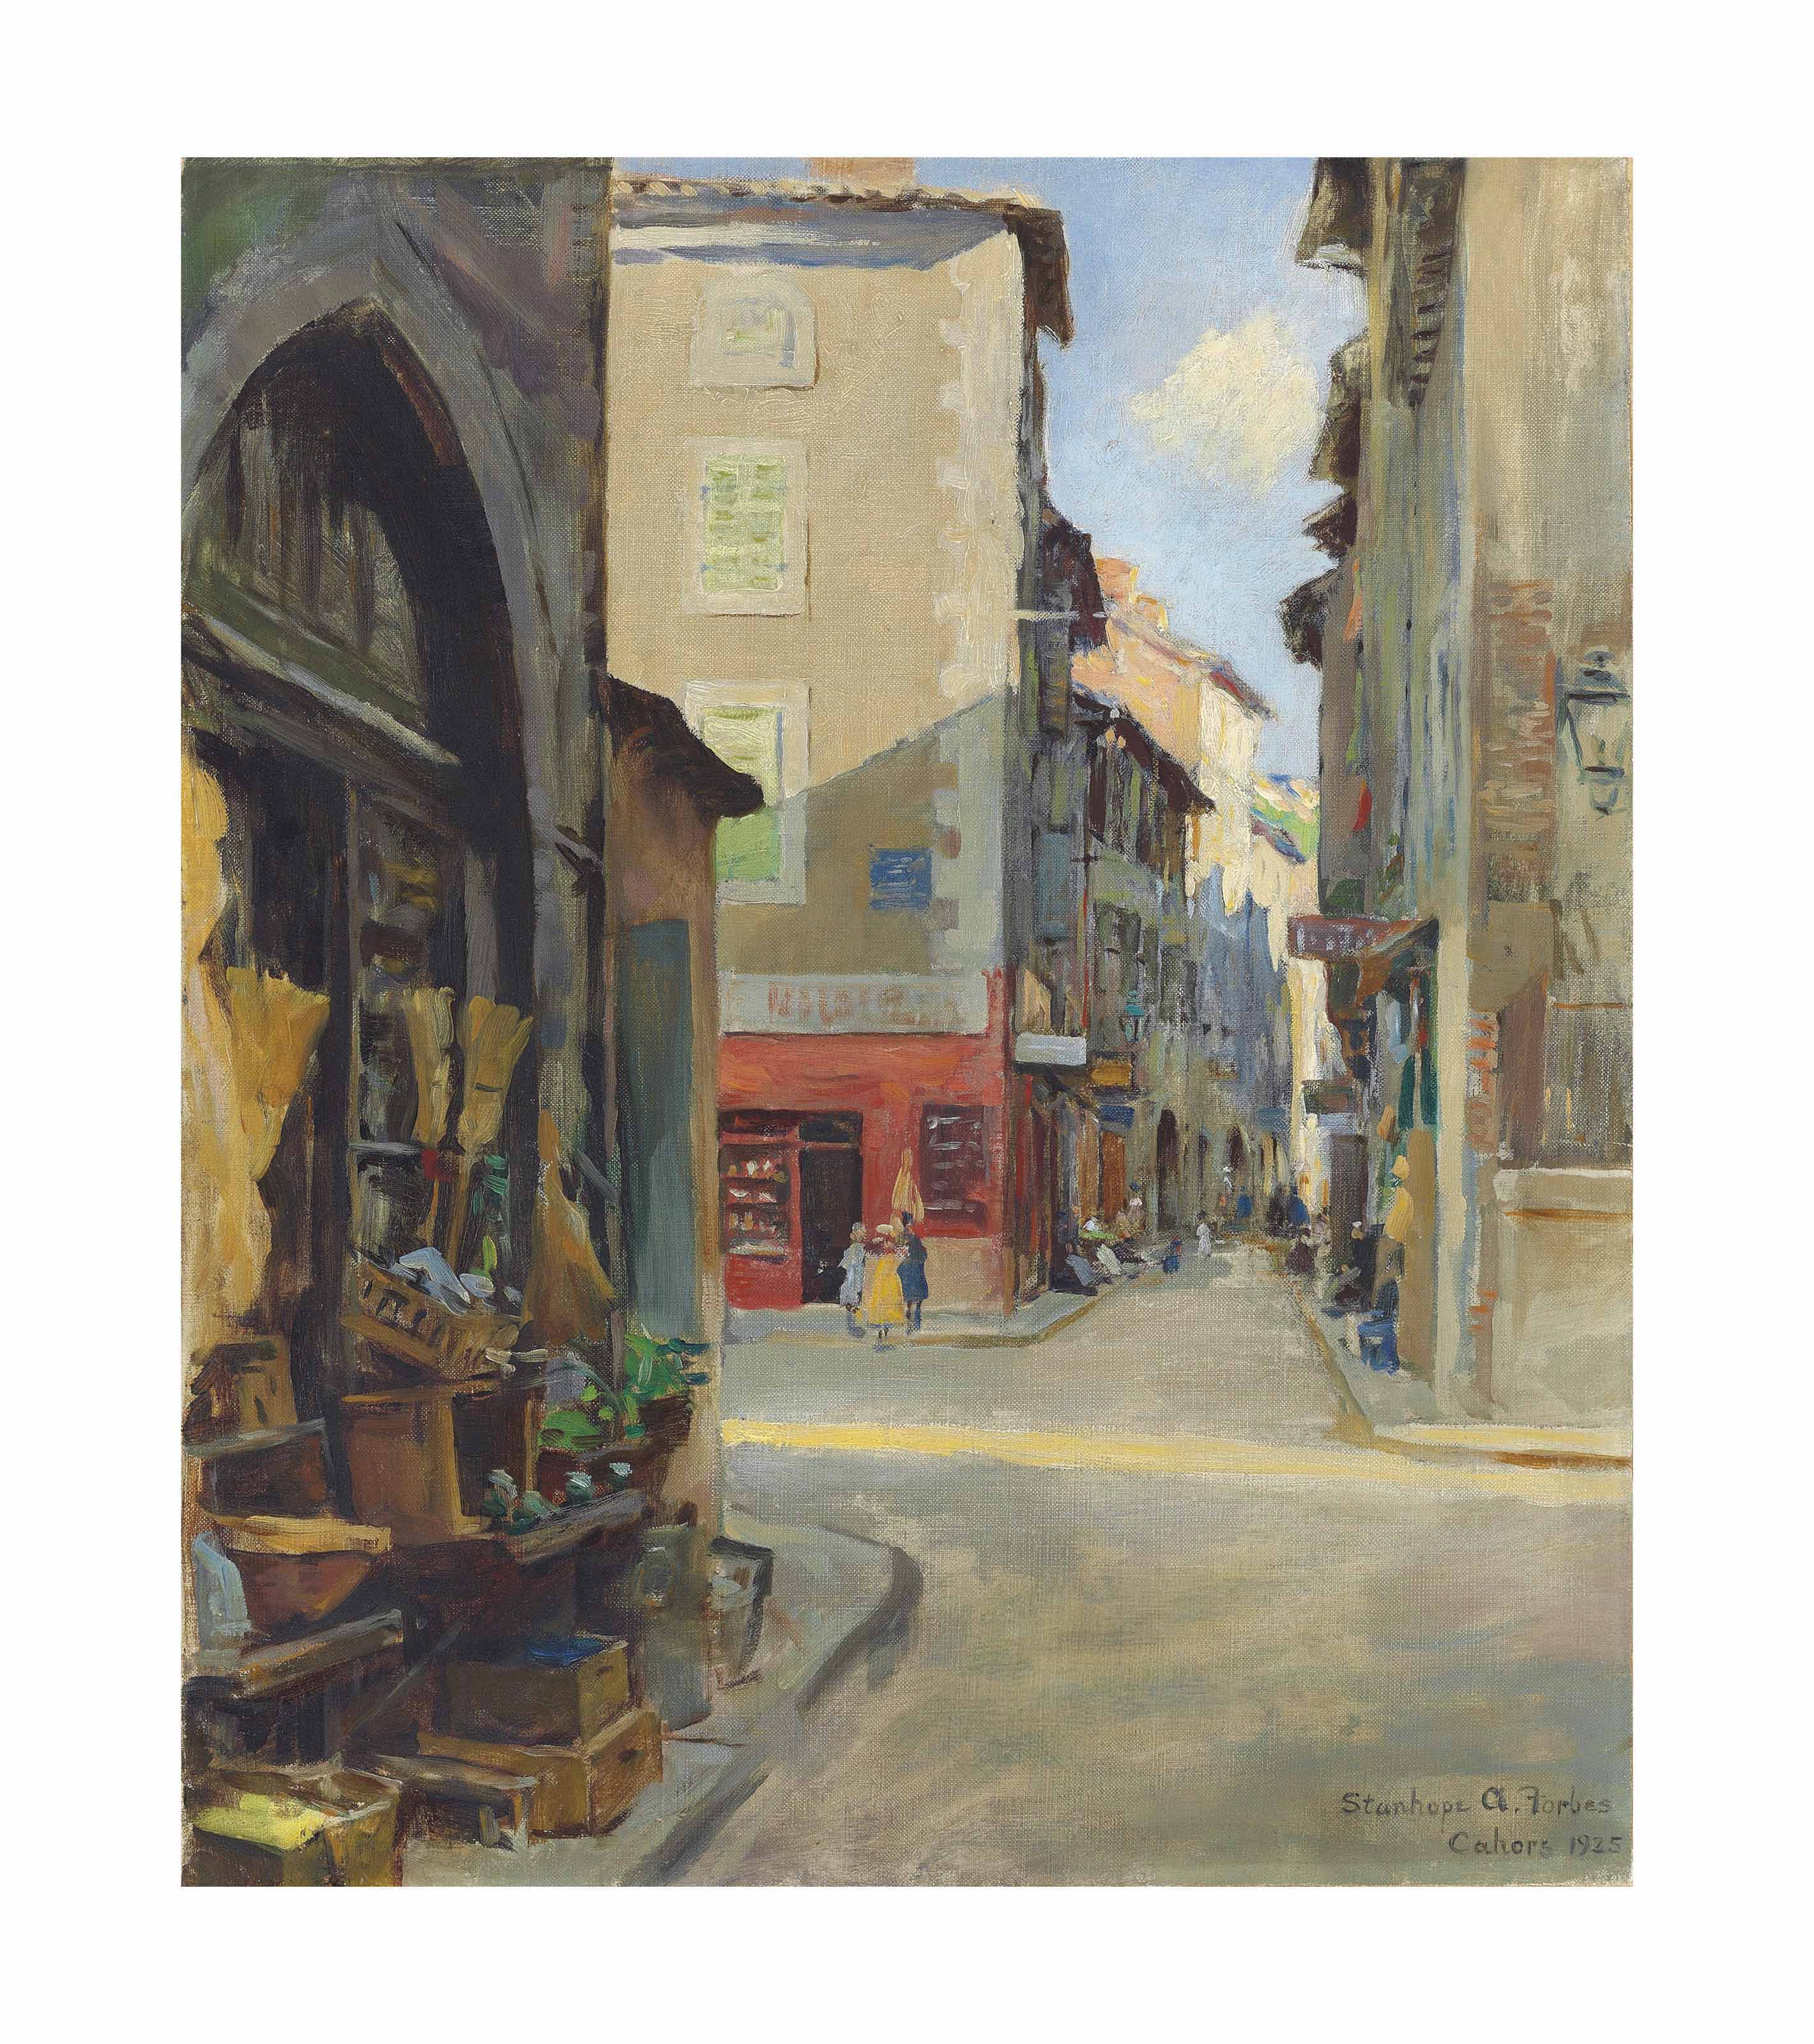 Street corner, Cahors